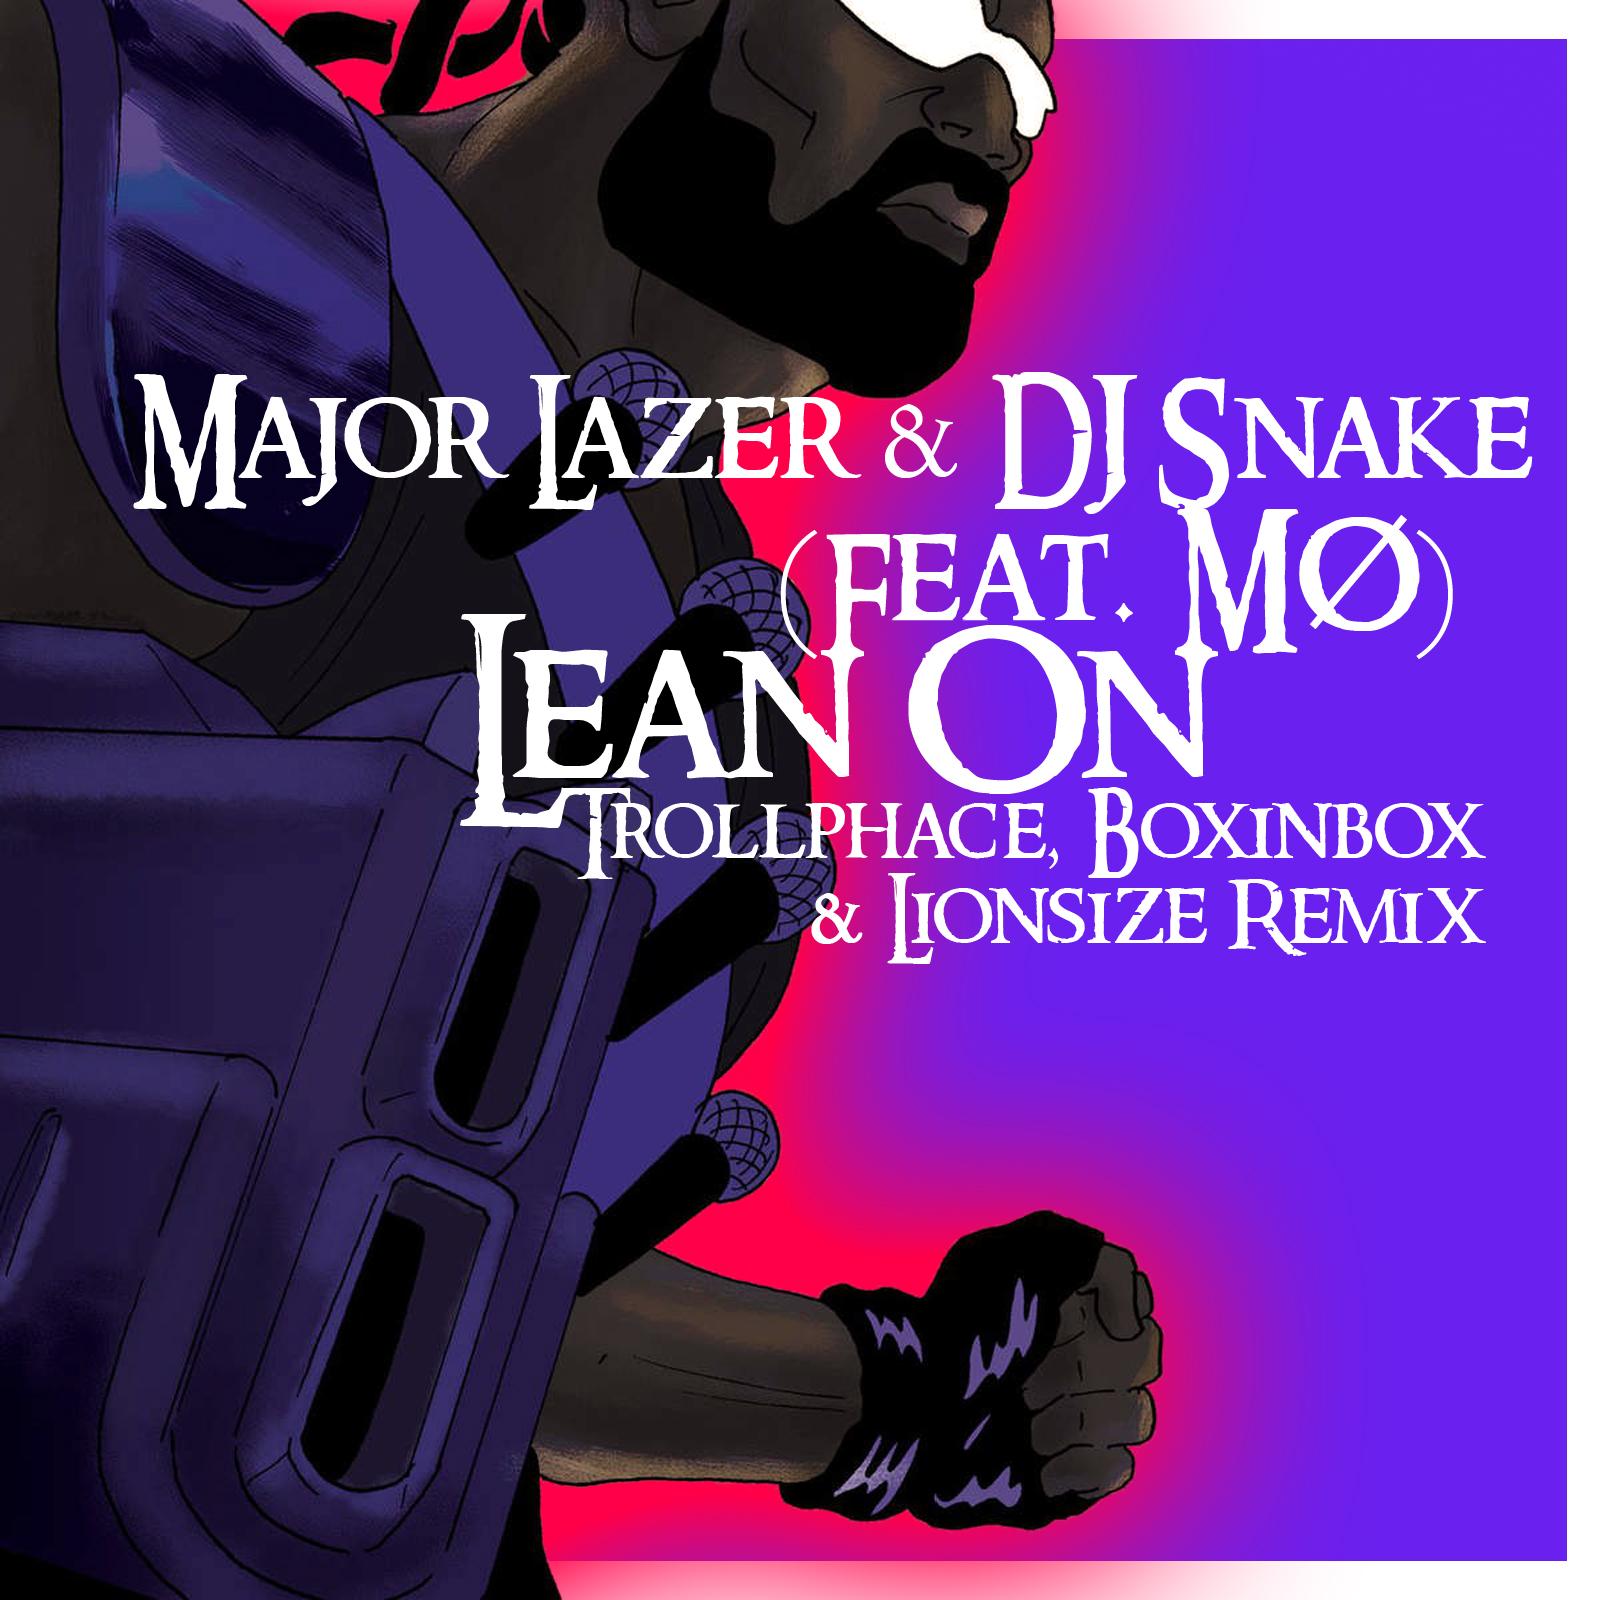 Major Lazer & DJ Snake (feat. M?) - Lean On (Trollphace, Boxinbox & Lionsize Remix)